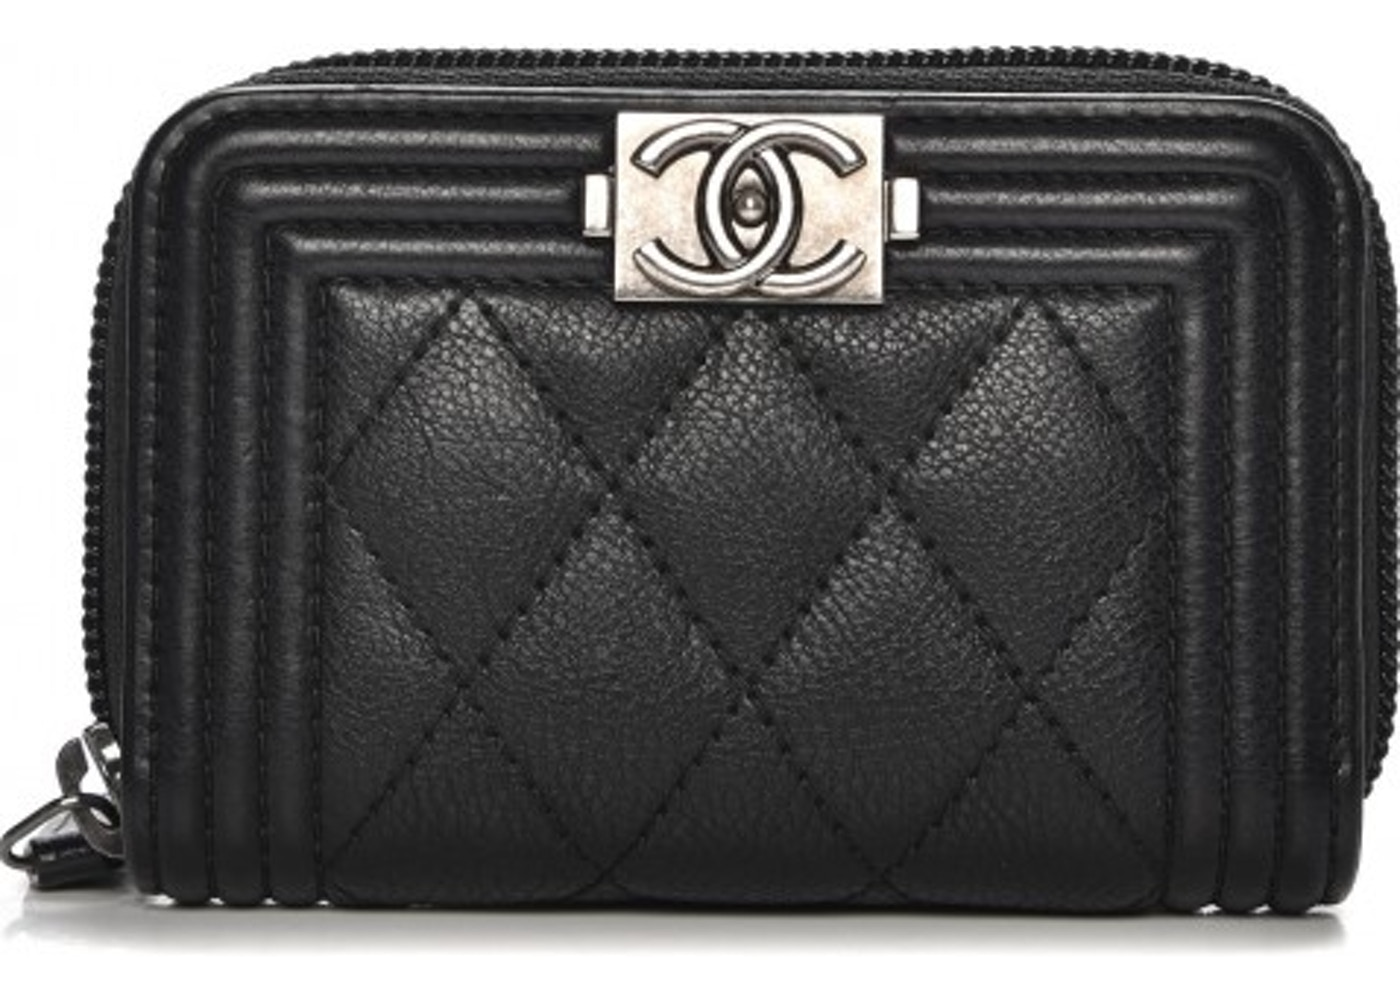 04a76cc8f1677b Chanel Zip Around Boy Coin Purse Wallet Quilted Diamond Black. Quilted  Diamond Black